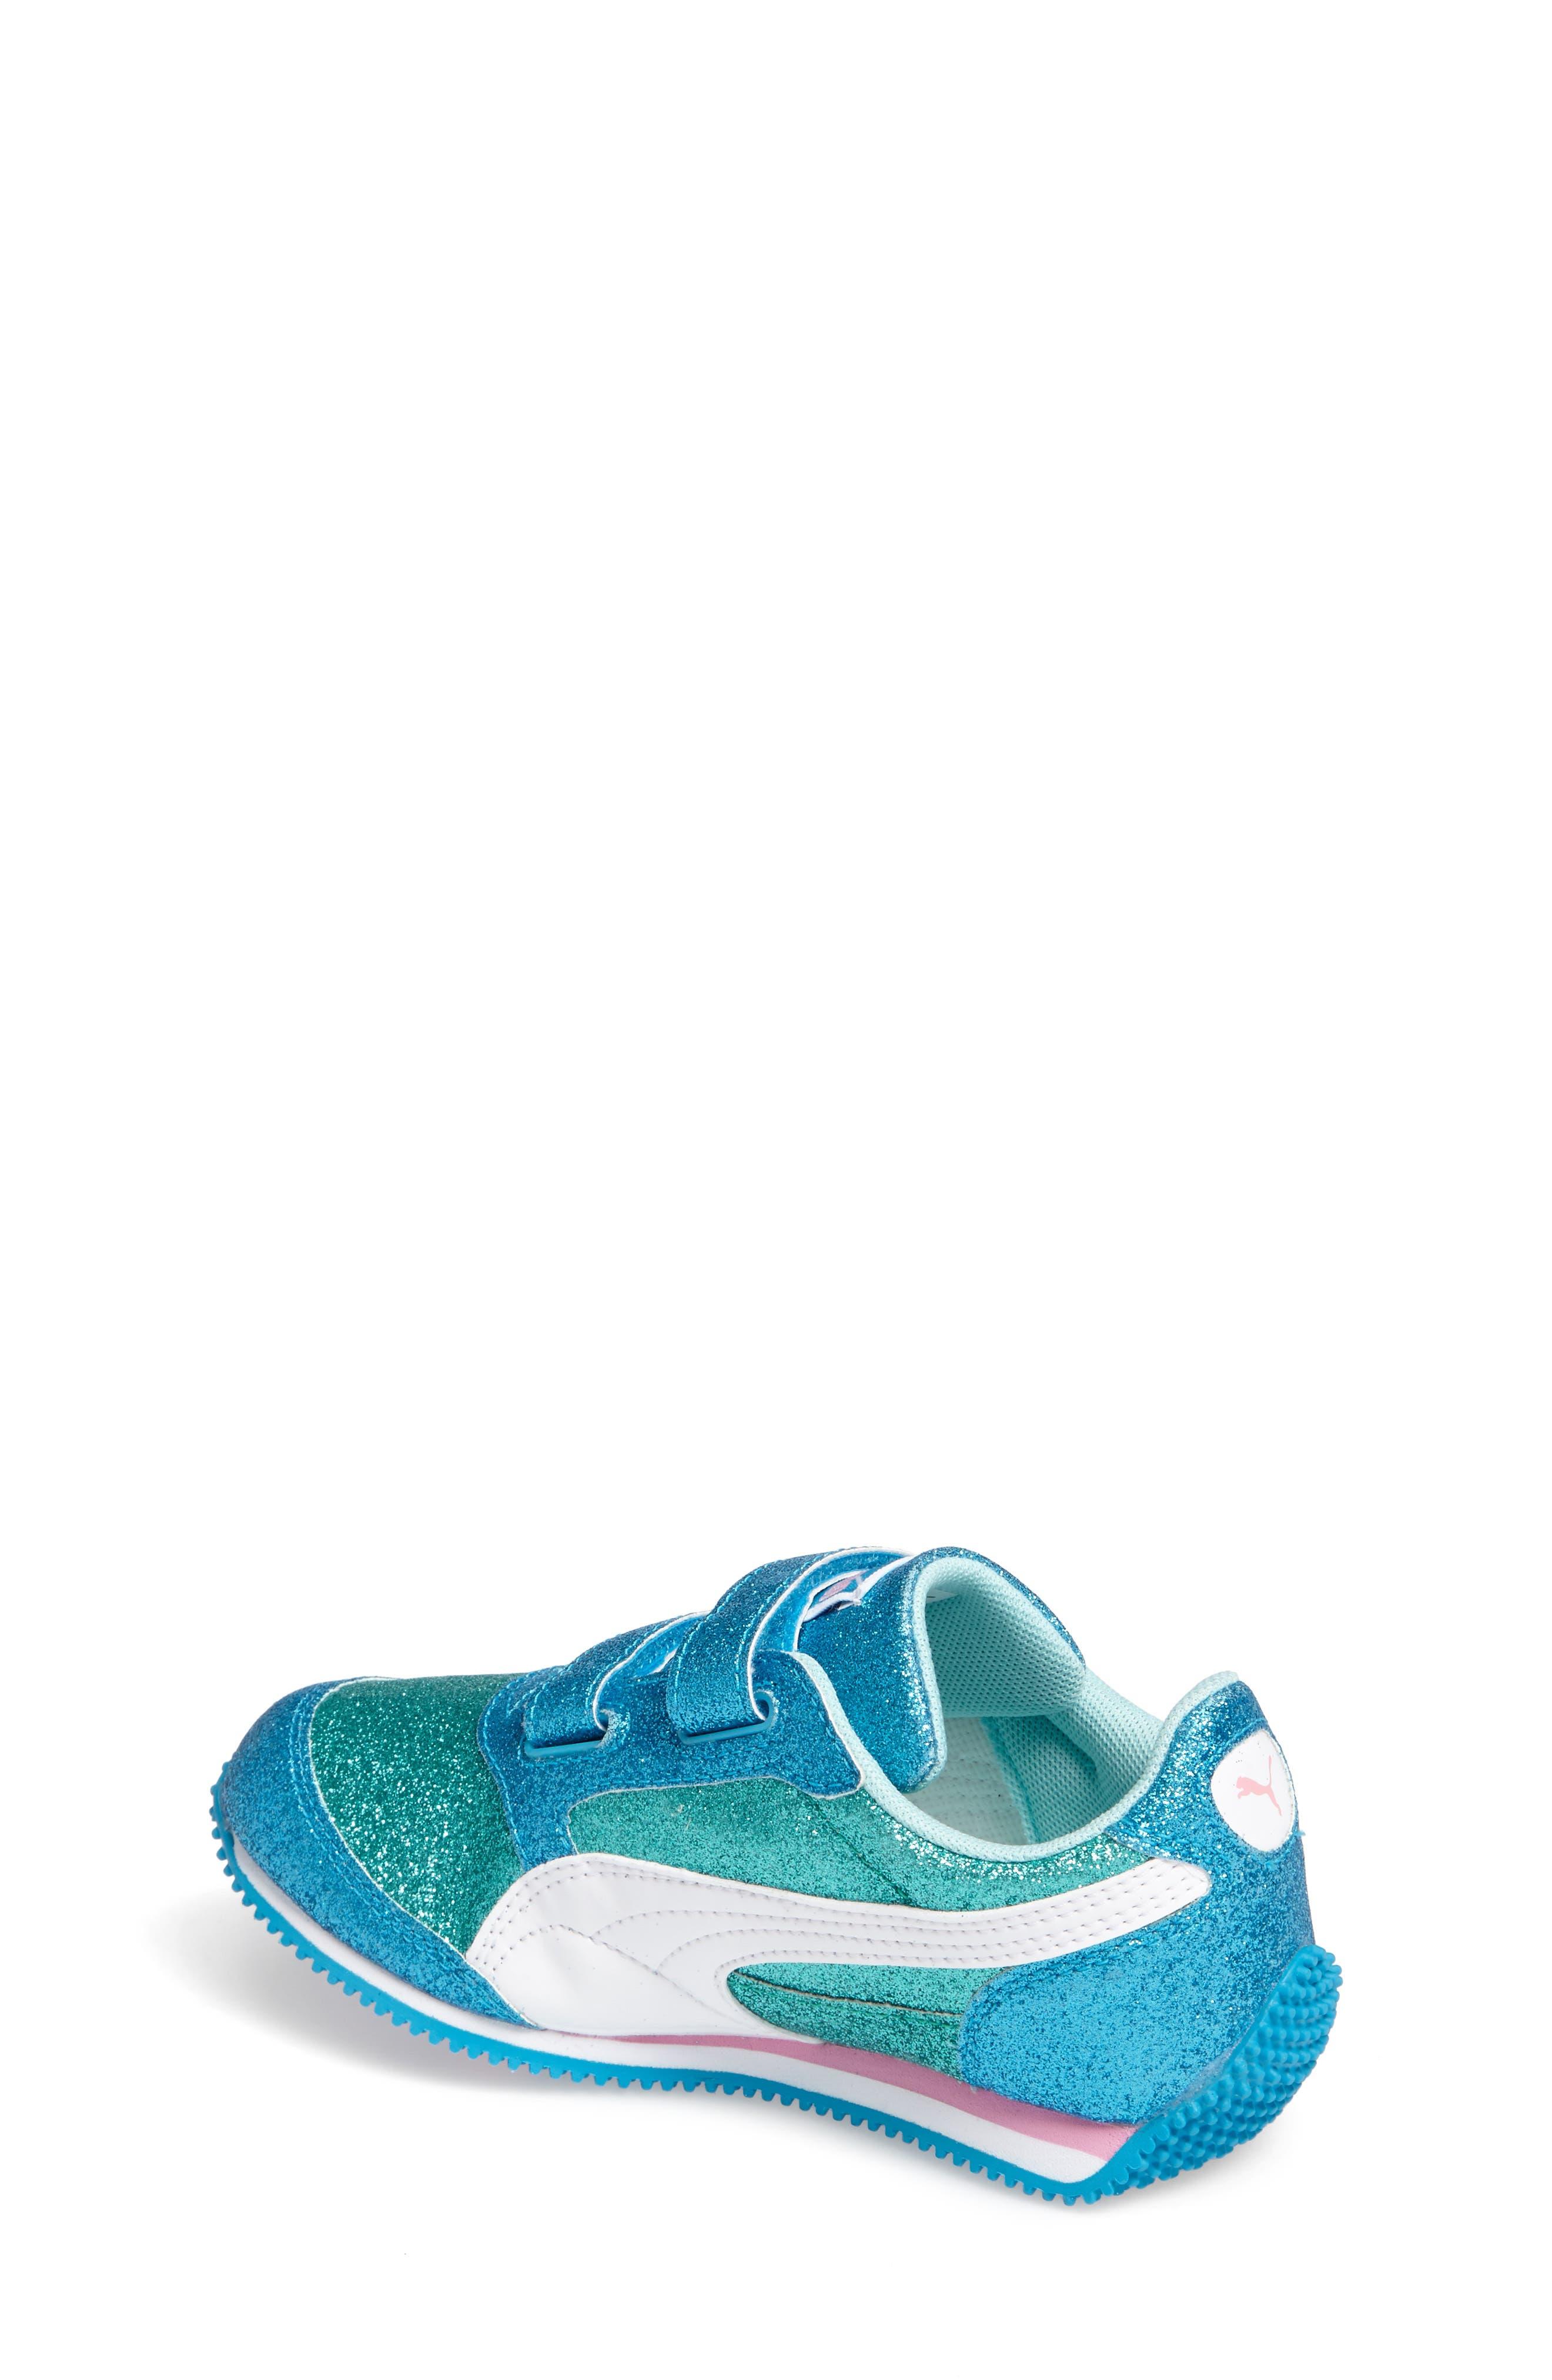 Alternate Image 2  - PUMA Steeple Glitz Glam Sneaker (Baby, Walker, Toddler, Little Kid & Big Kid)